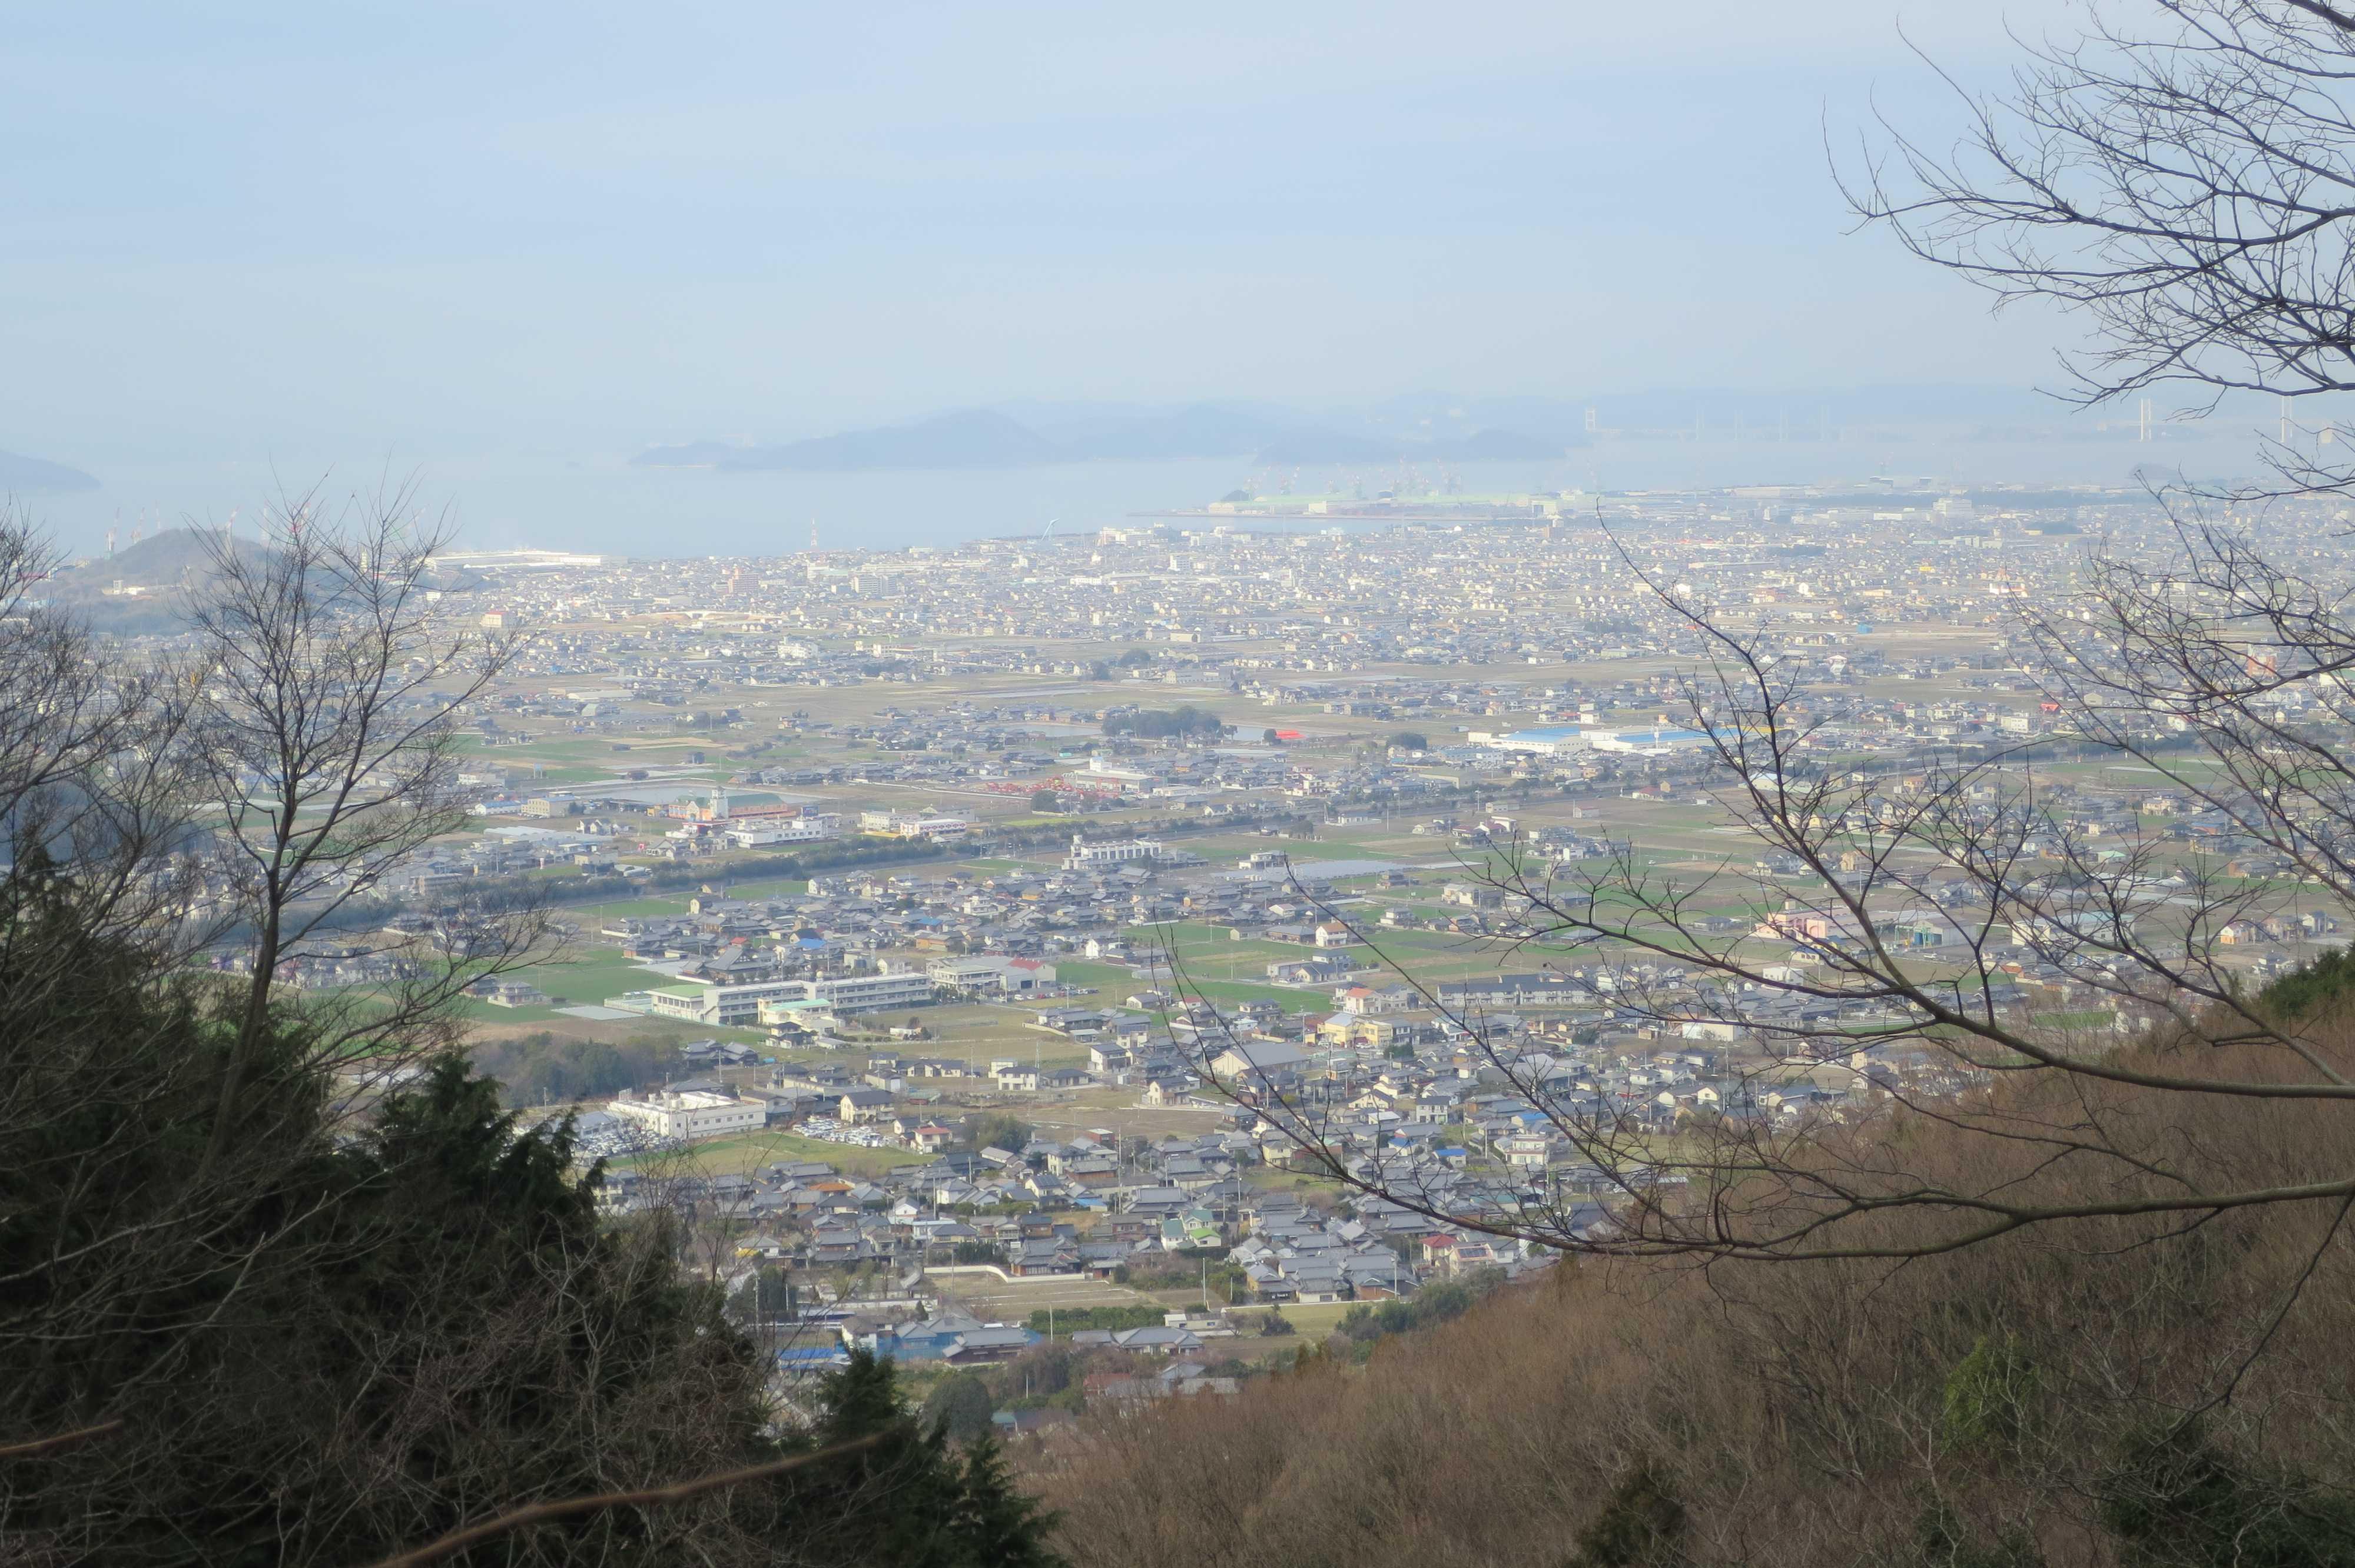 瀬戸内海と讃岐平野 - 奥の院捨身ヶ嶽禅定